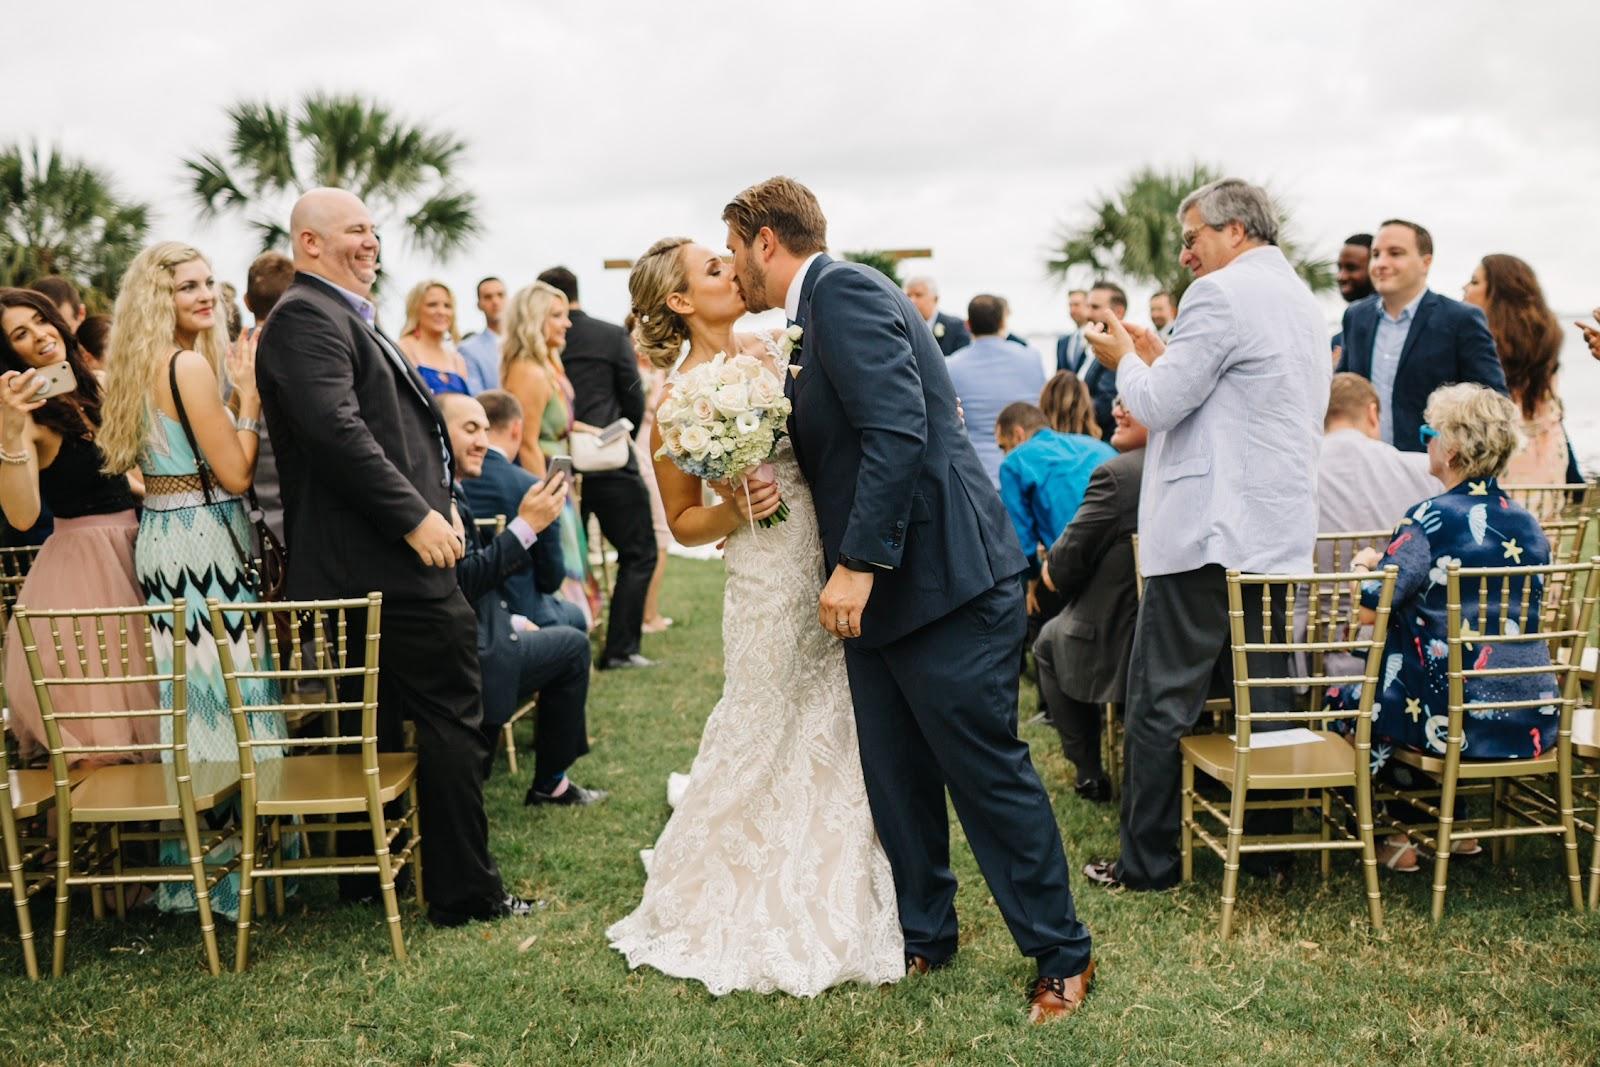 Sarah Colburn Matt Audibert Destination Wedding Planning Wedding Kiss